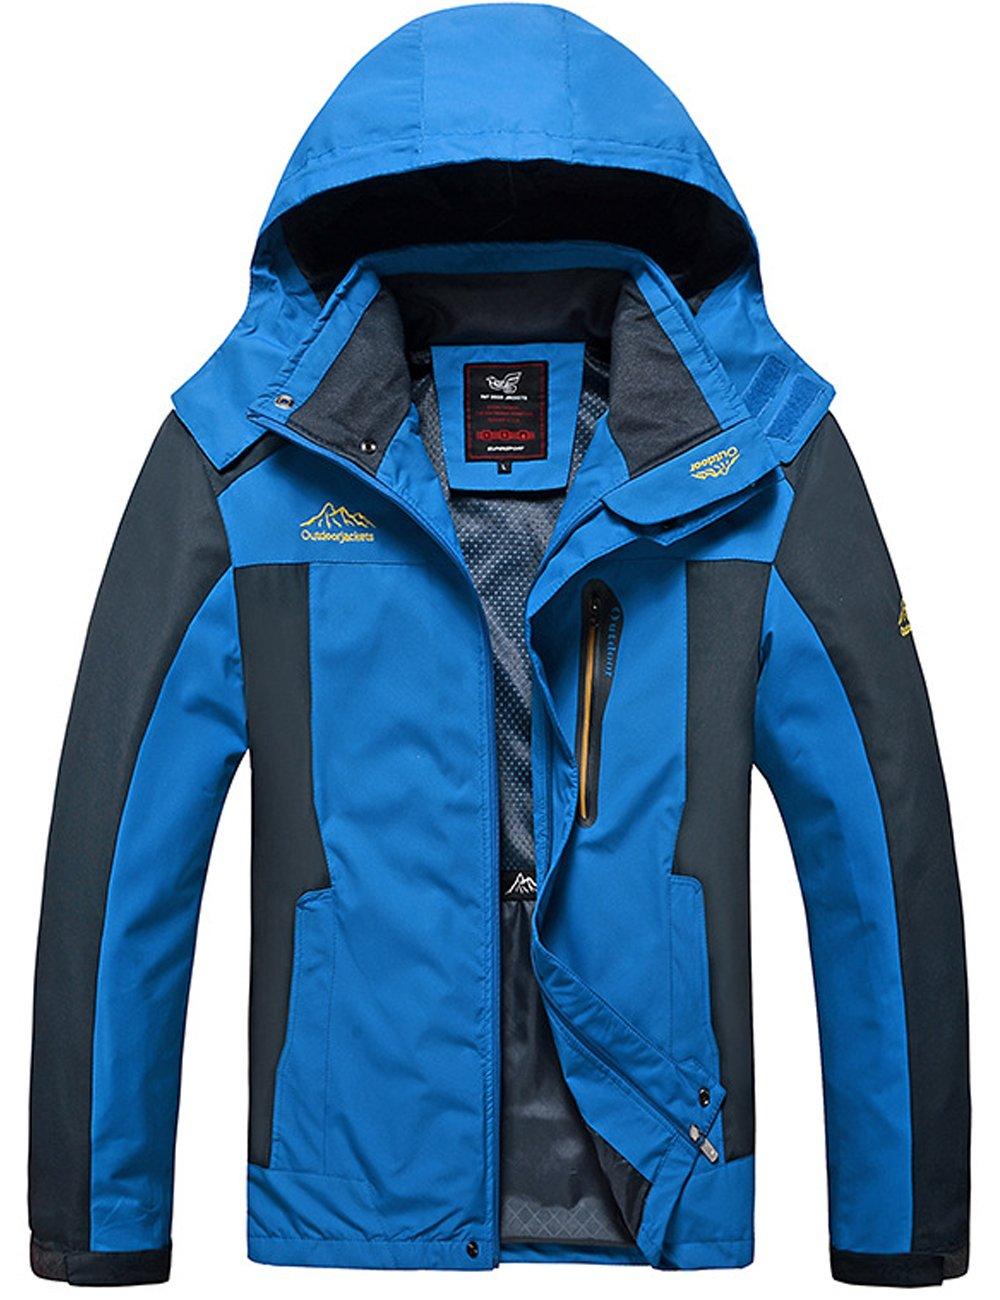 Menschwear OUTERWEAR メンズ B076JHQ4FY L|Blue 9929 Blue 9929 L